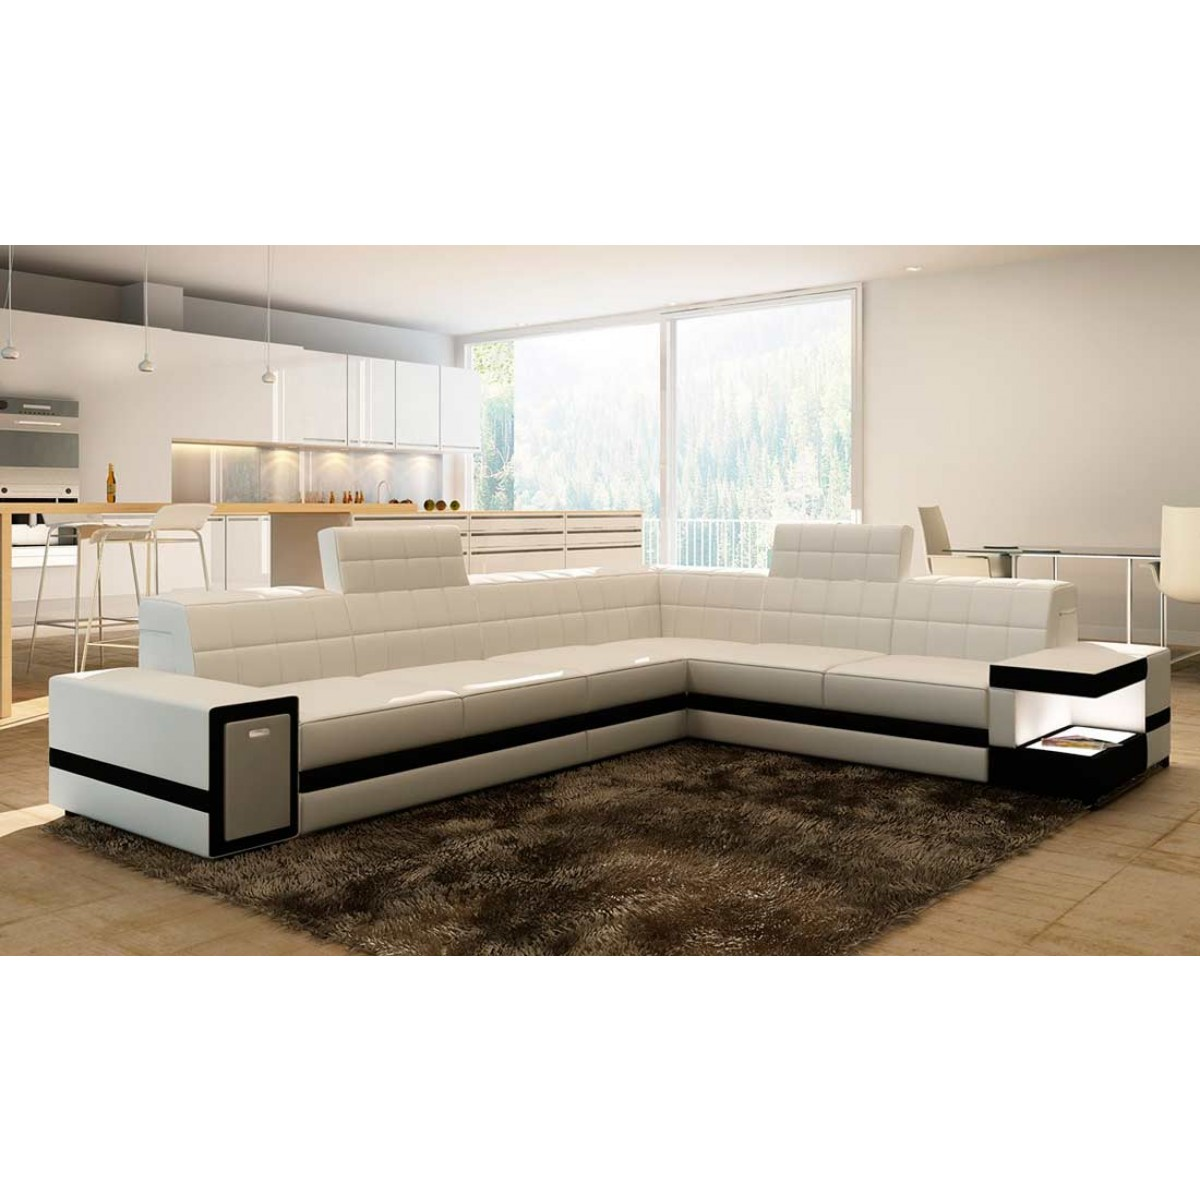 grand canap d 39 angle en cuir brest pop. Black Bedroom Furniture Sets. Home Design Ideas